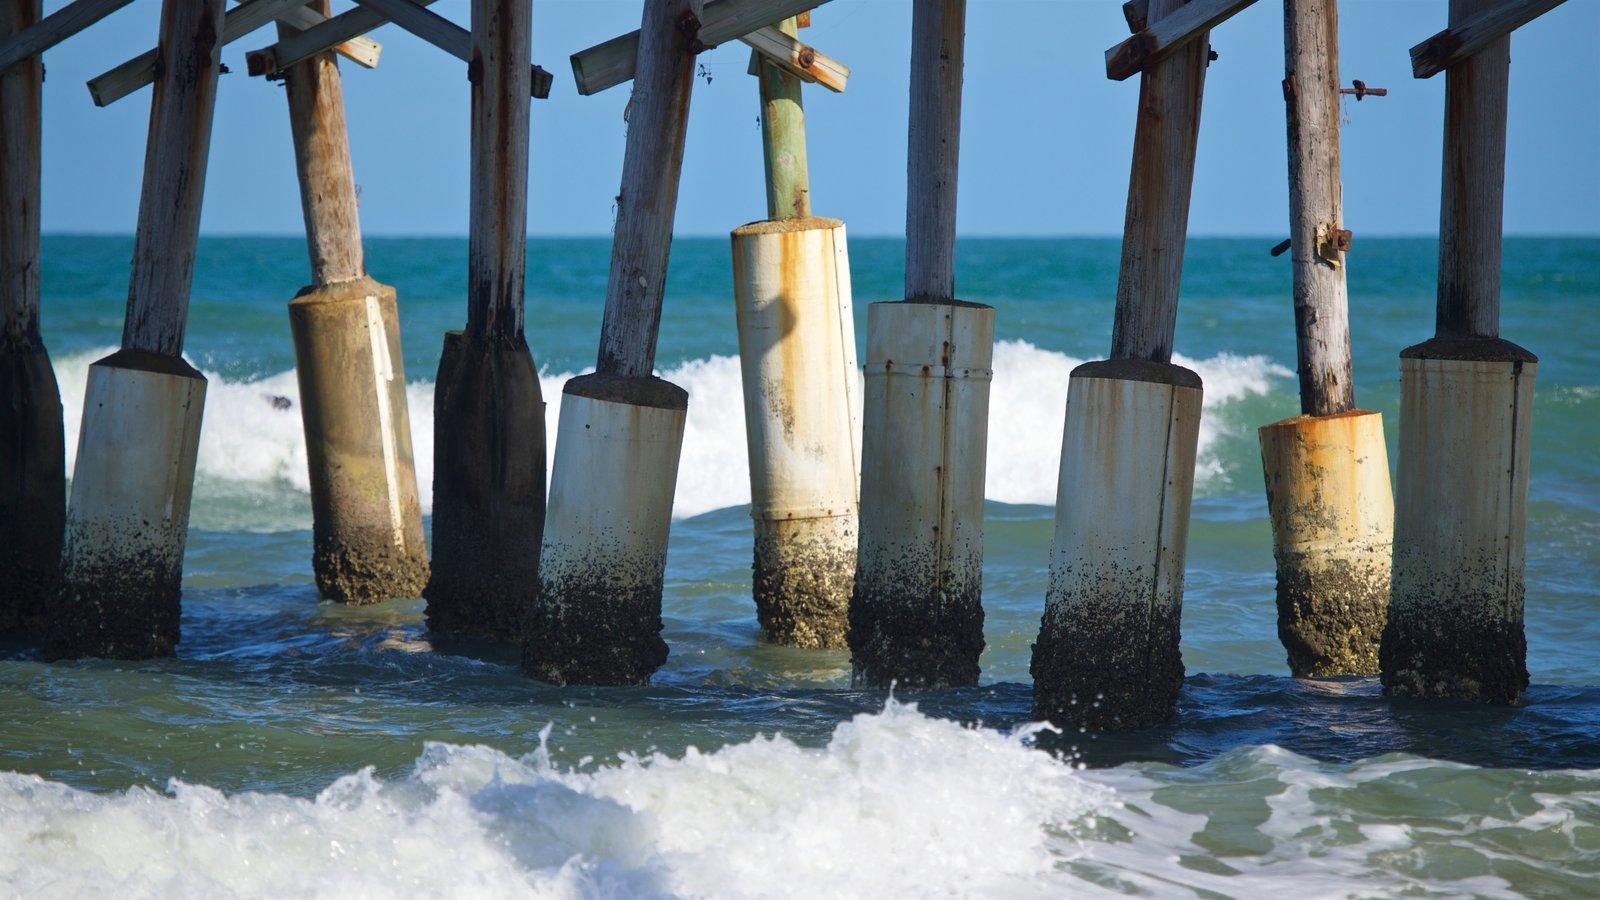 Cocoa Beach Pier showing general coastal views